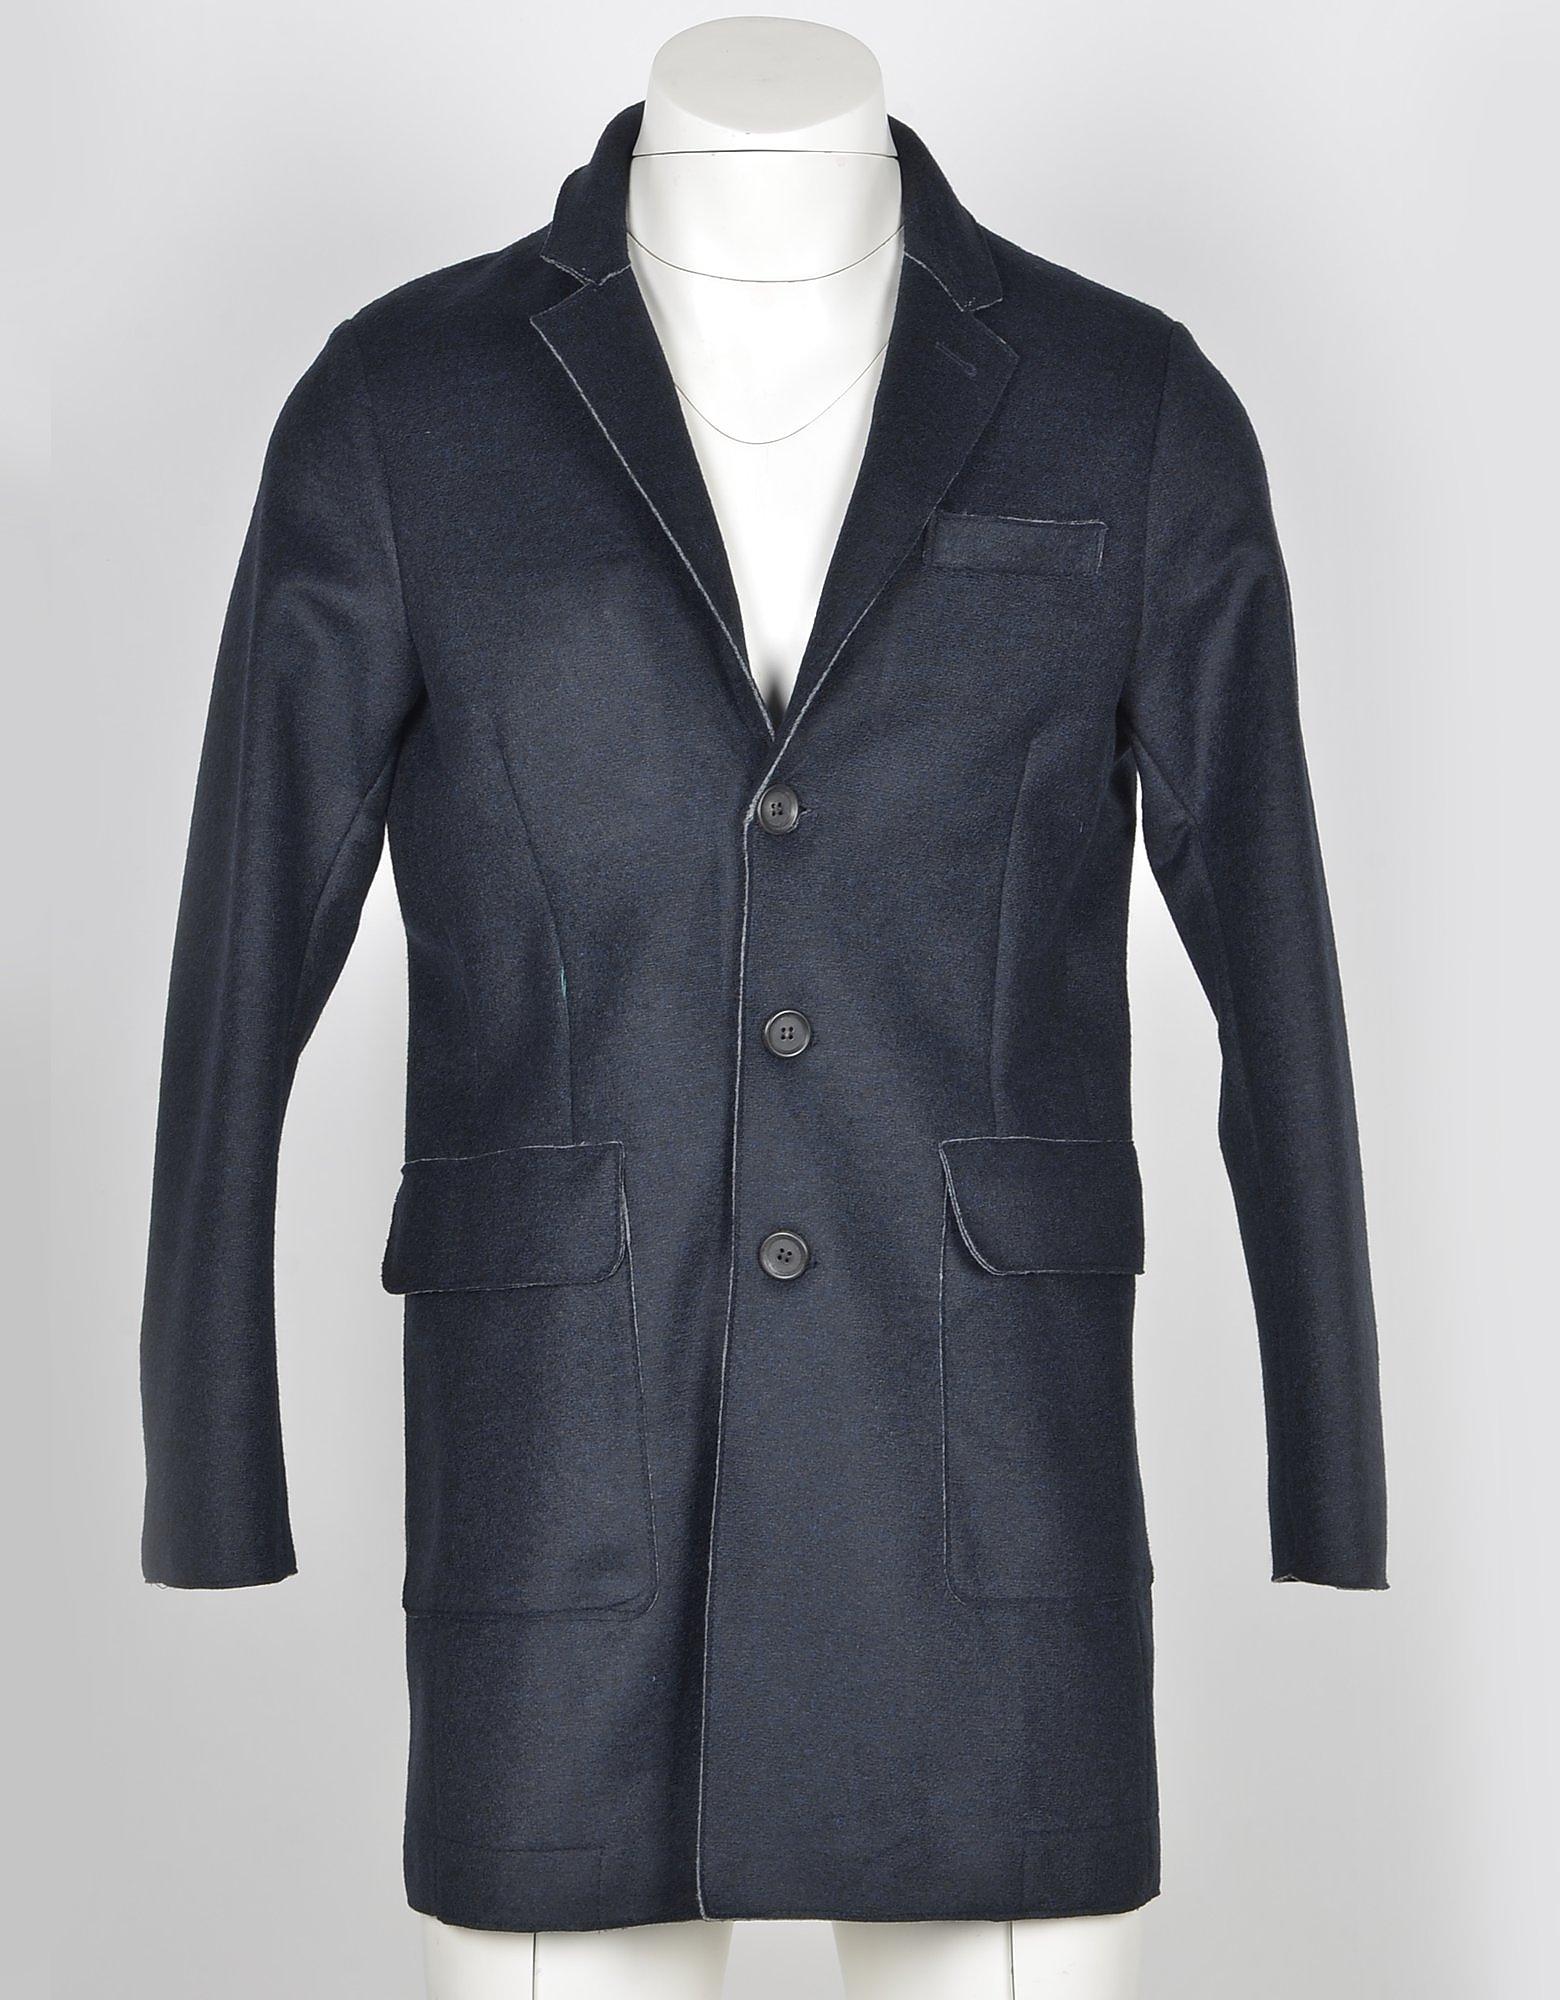 Fradi Designer Coats & Jackets, Men's Navy Blue Coat